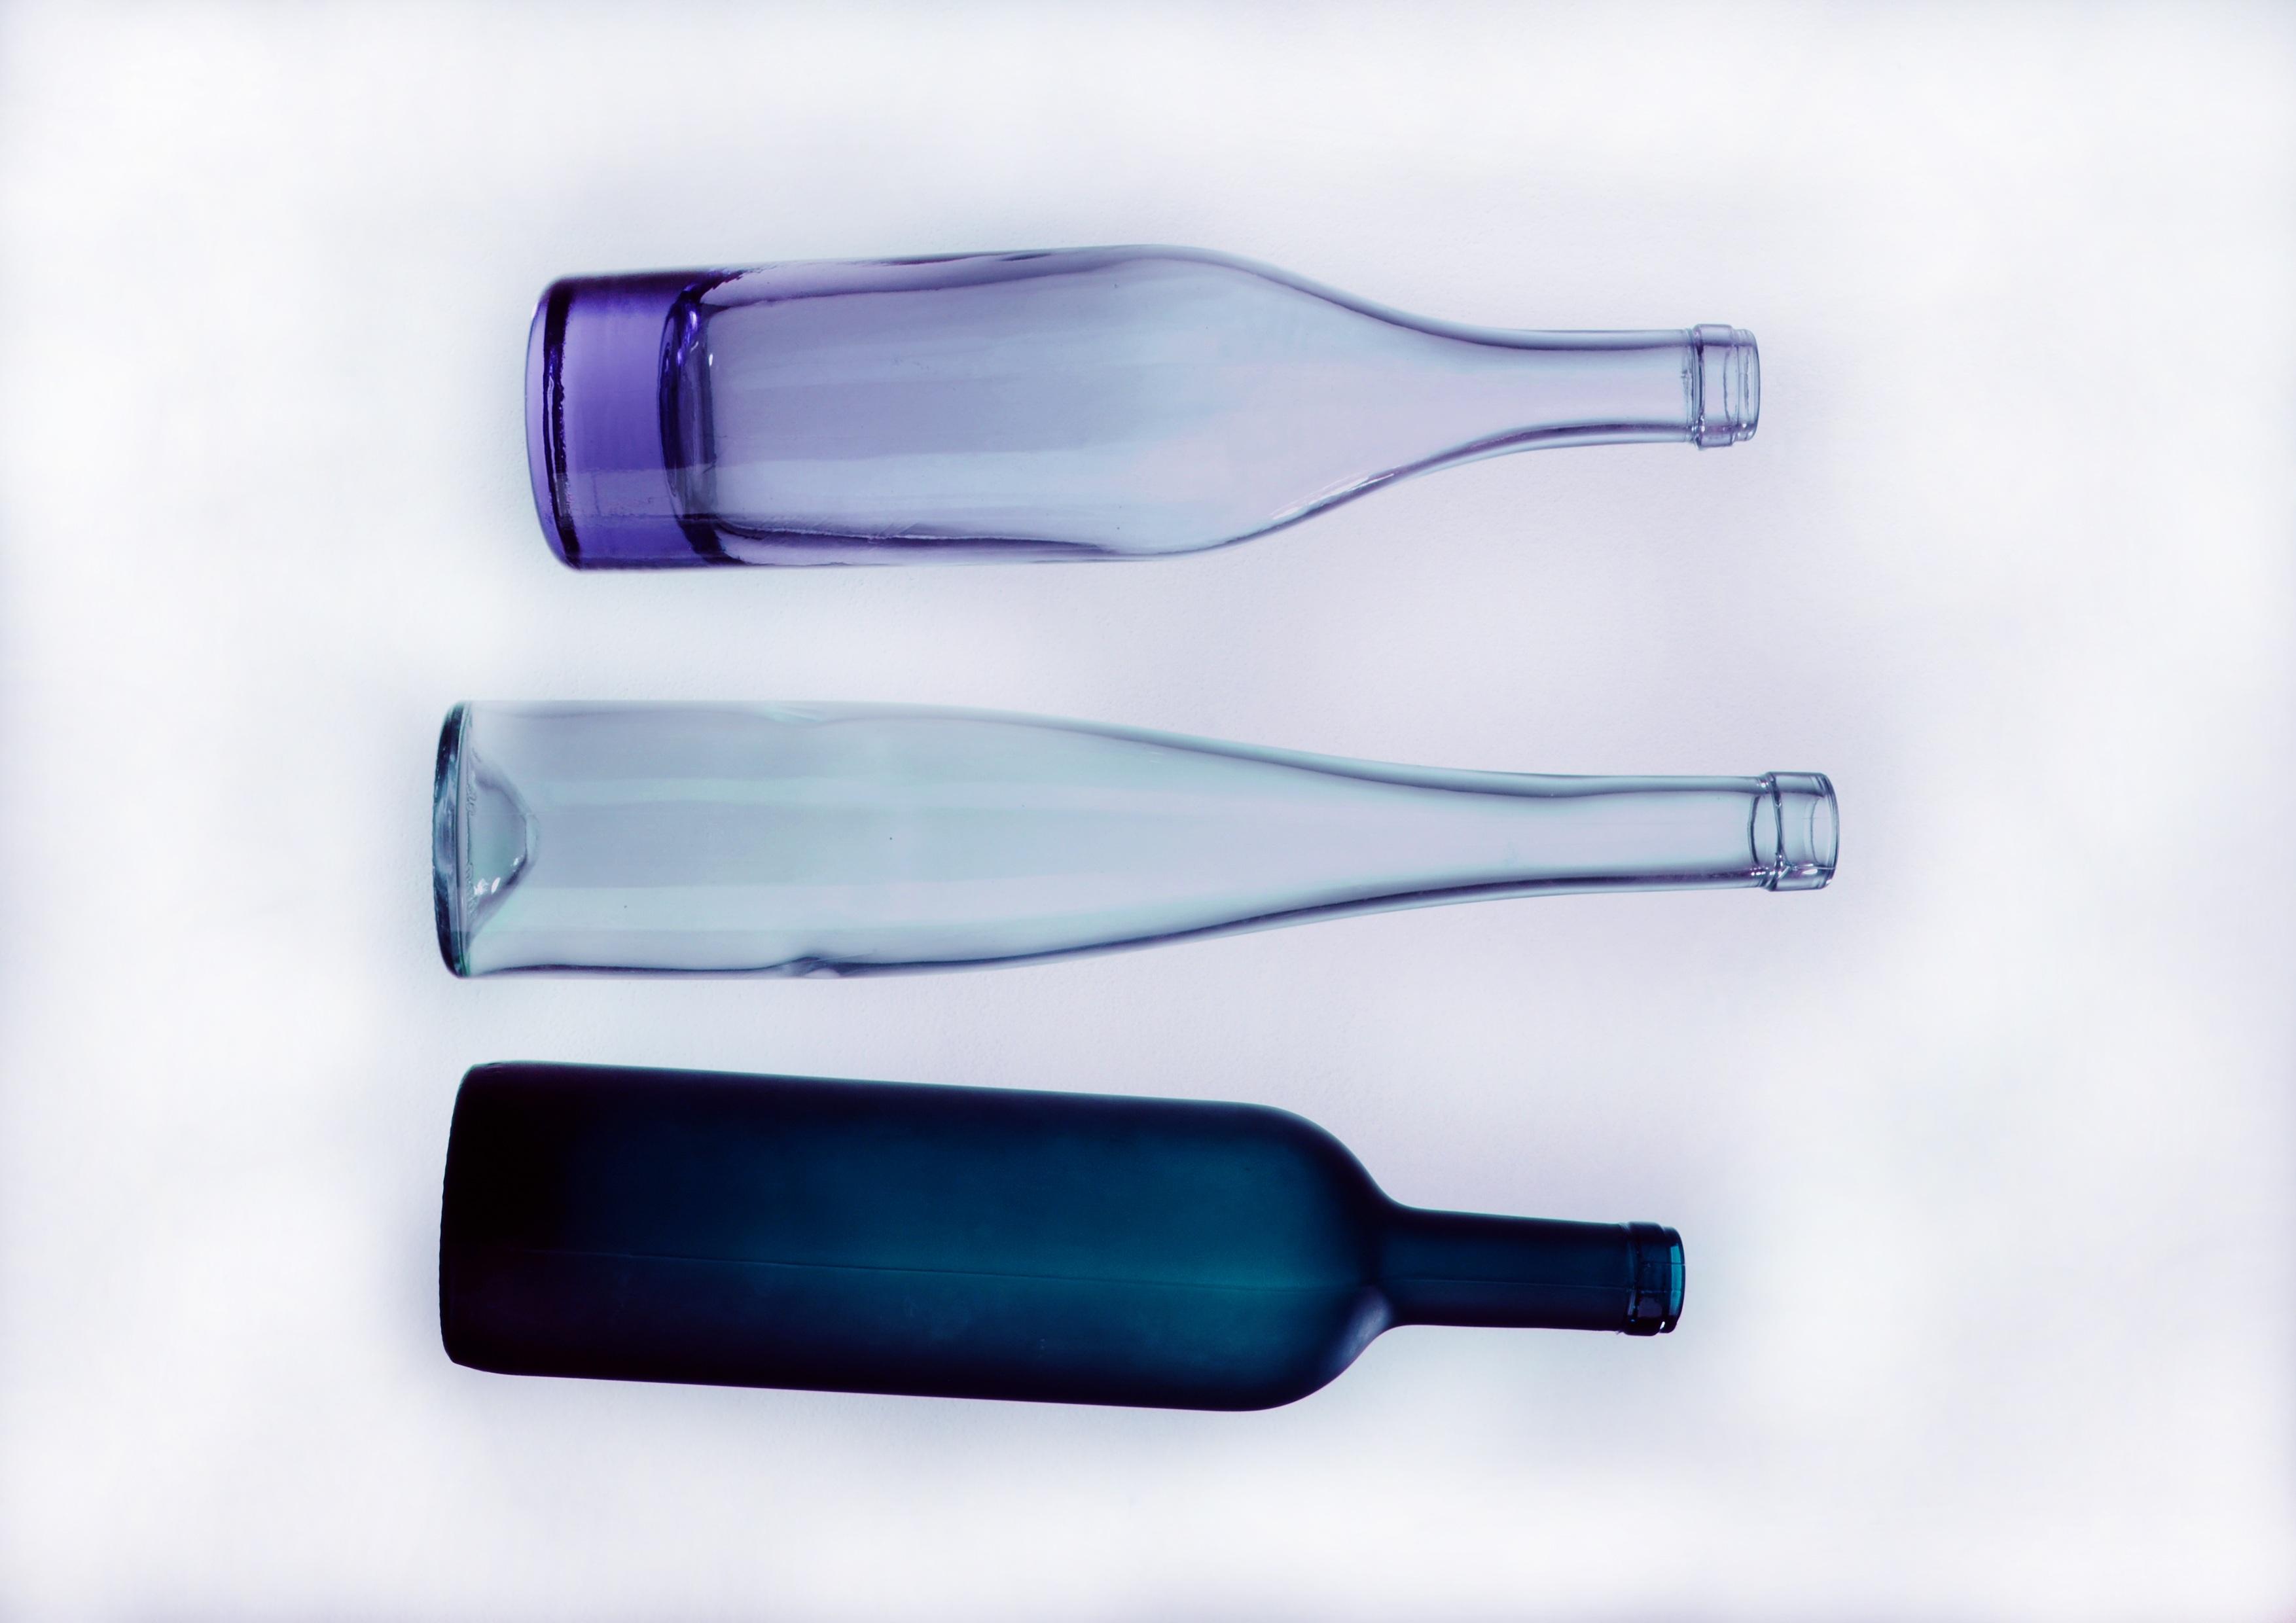 Gambar Ungu Kaca Foto Warna Studio Botol Biru Masih Hidup